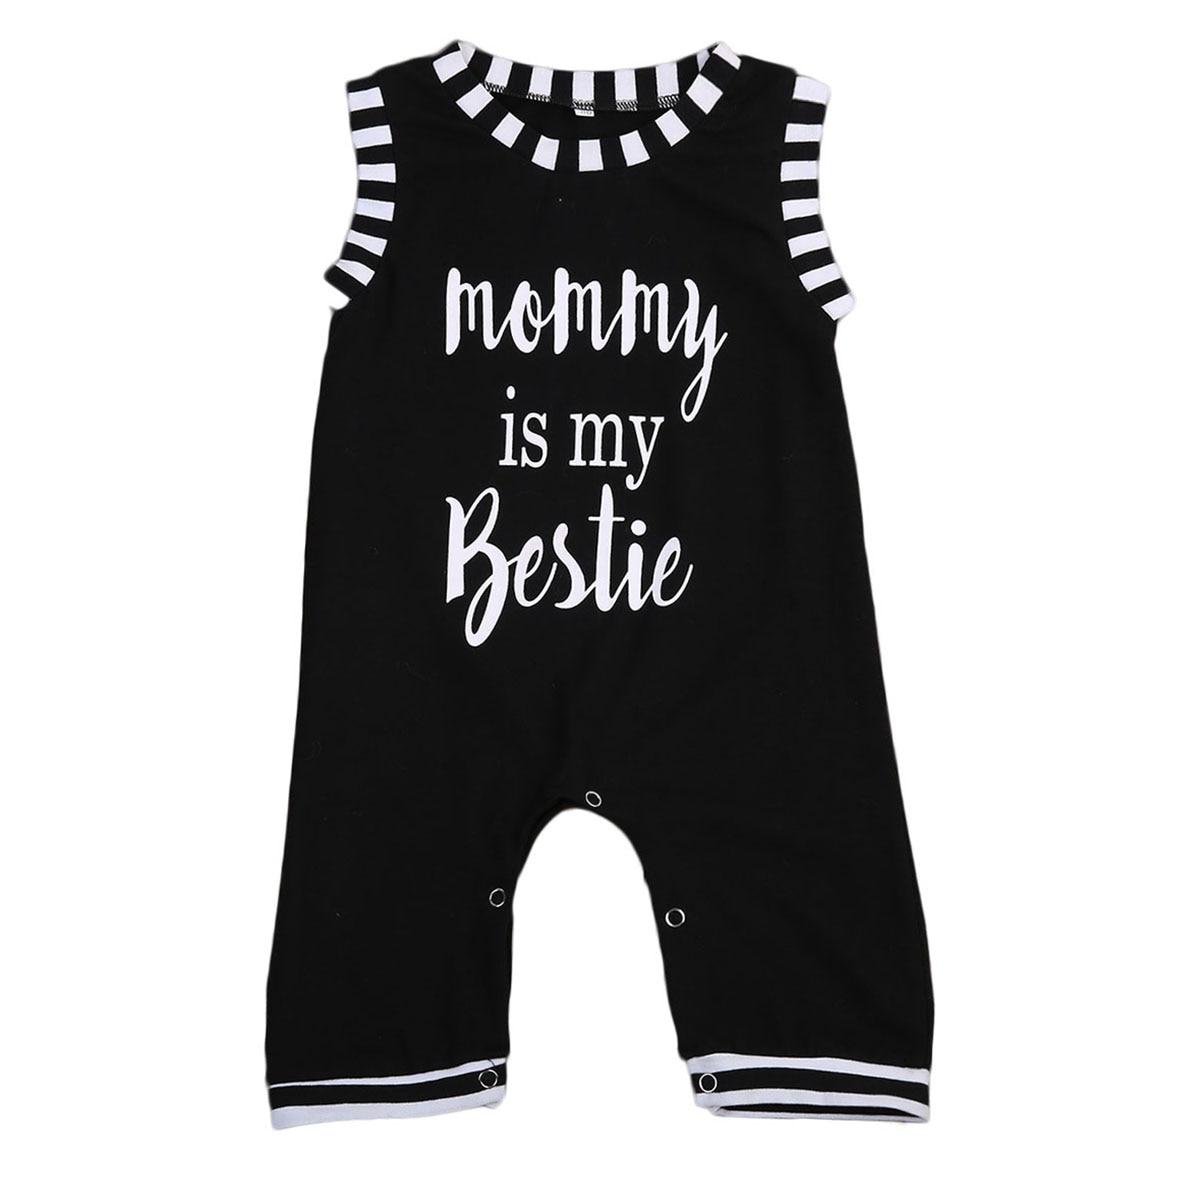 EE. UU. Bebé niños niño niña infantil de verano mamá es mi mejor impresa mameluco a rayas sin mangas StitchingJumpsuit trajes